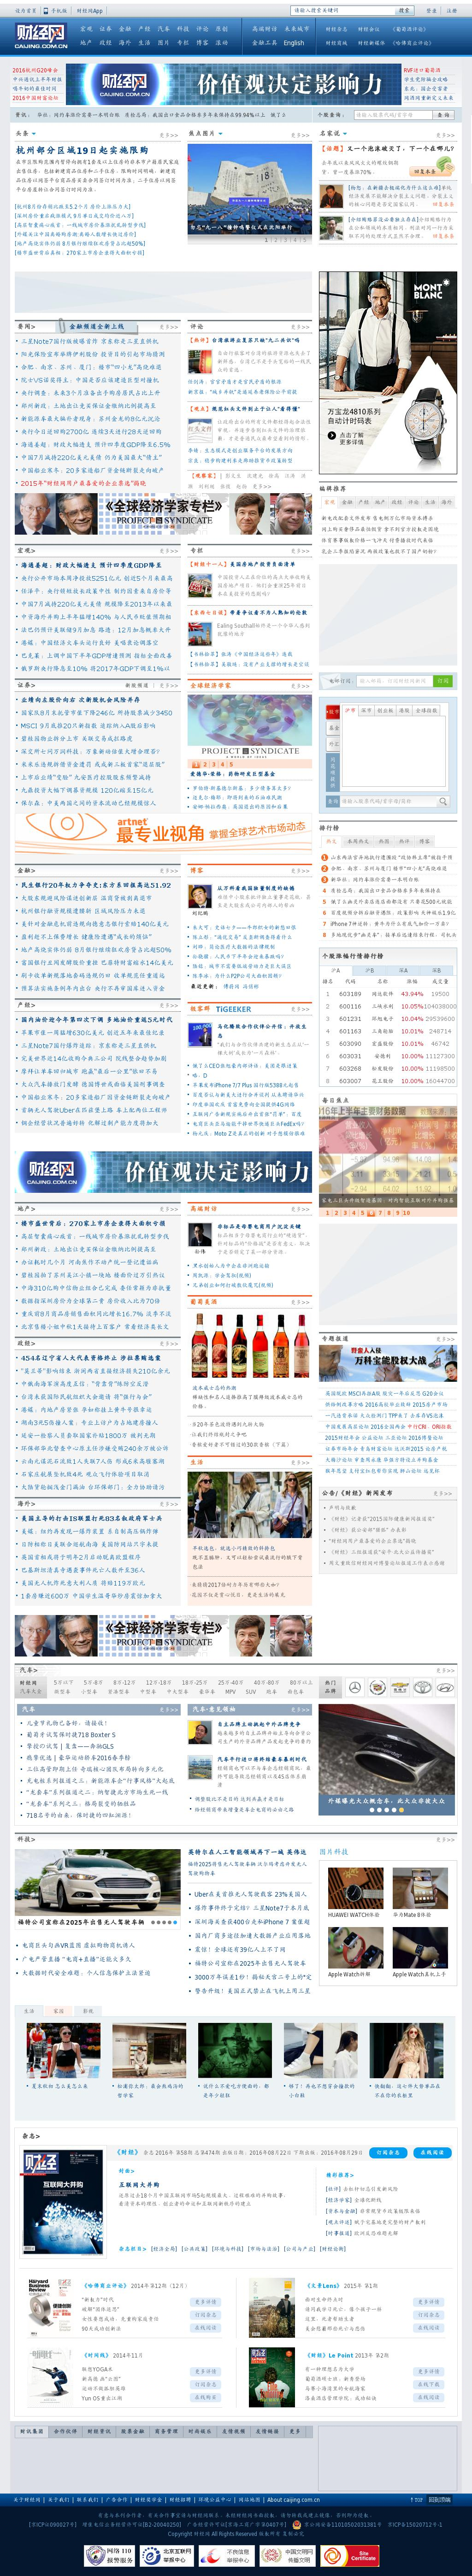 Caijing at Sunday Sept. 18, 2016, 6:01 p.m. UTC